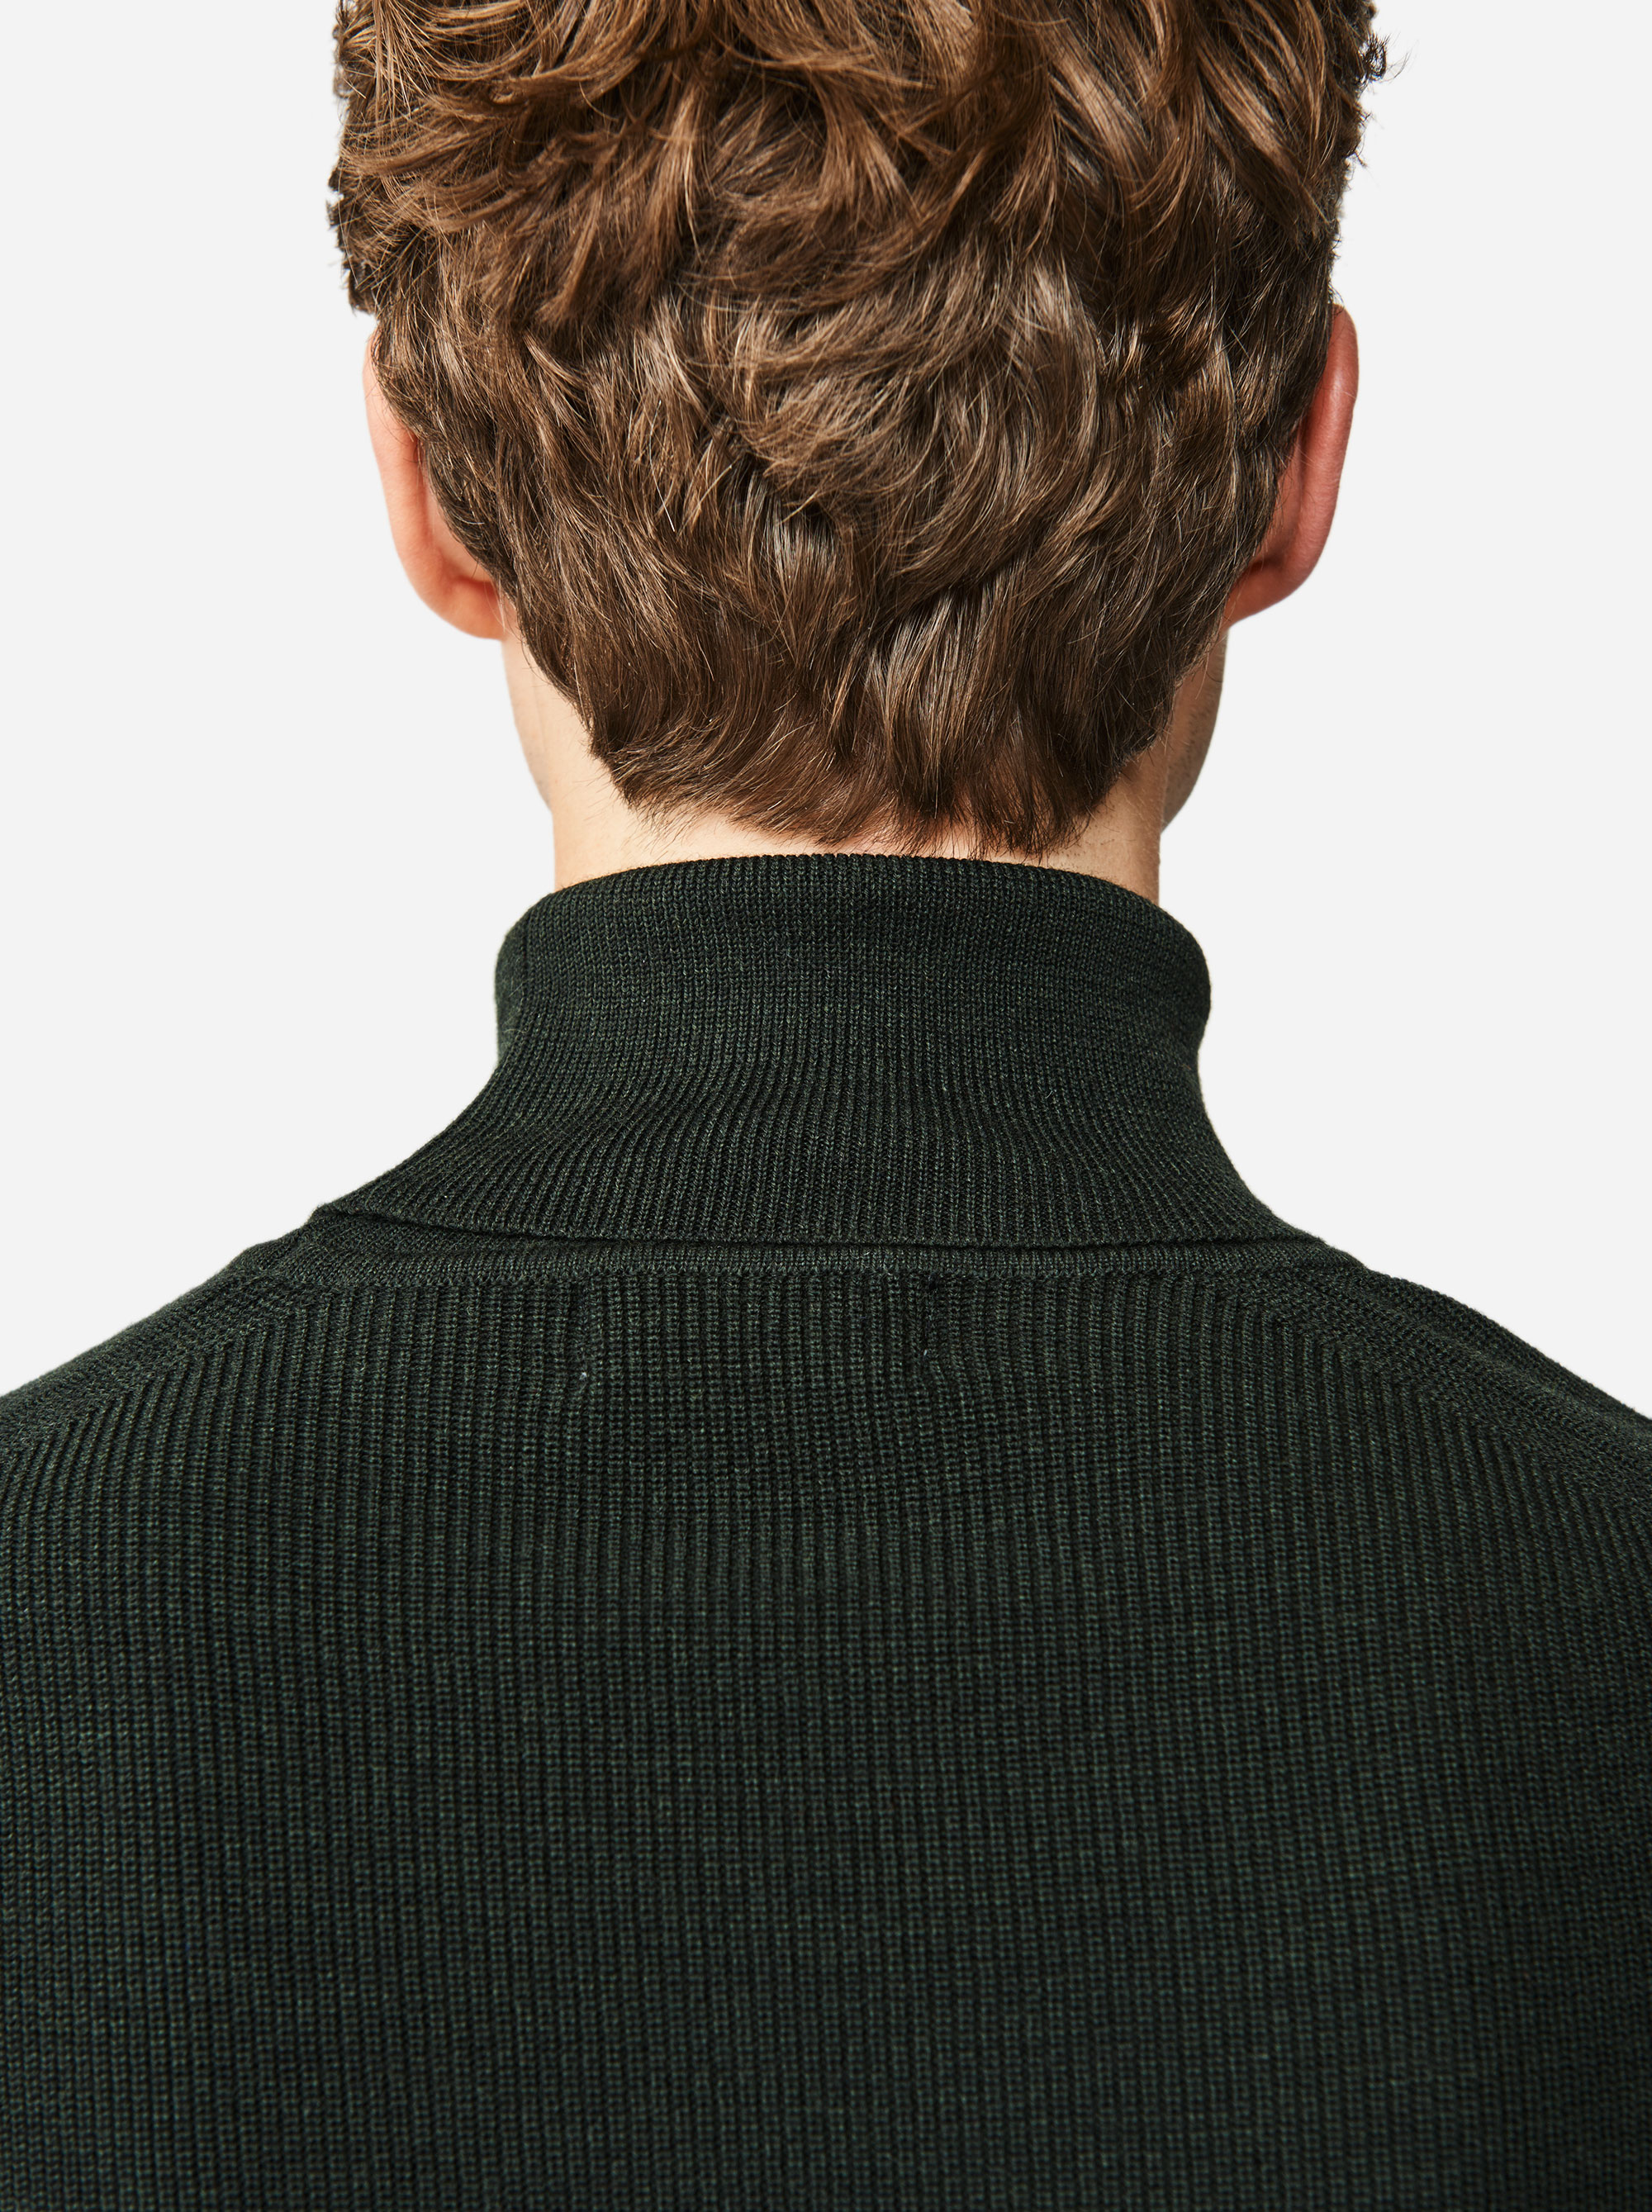 Teym - Turtleneck - The Merino Sweater - Men - Green - 1